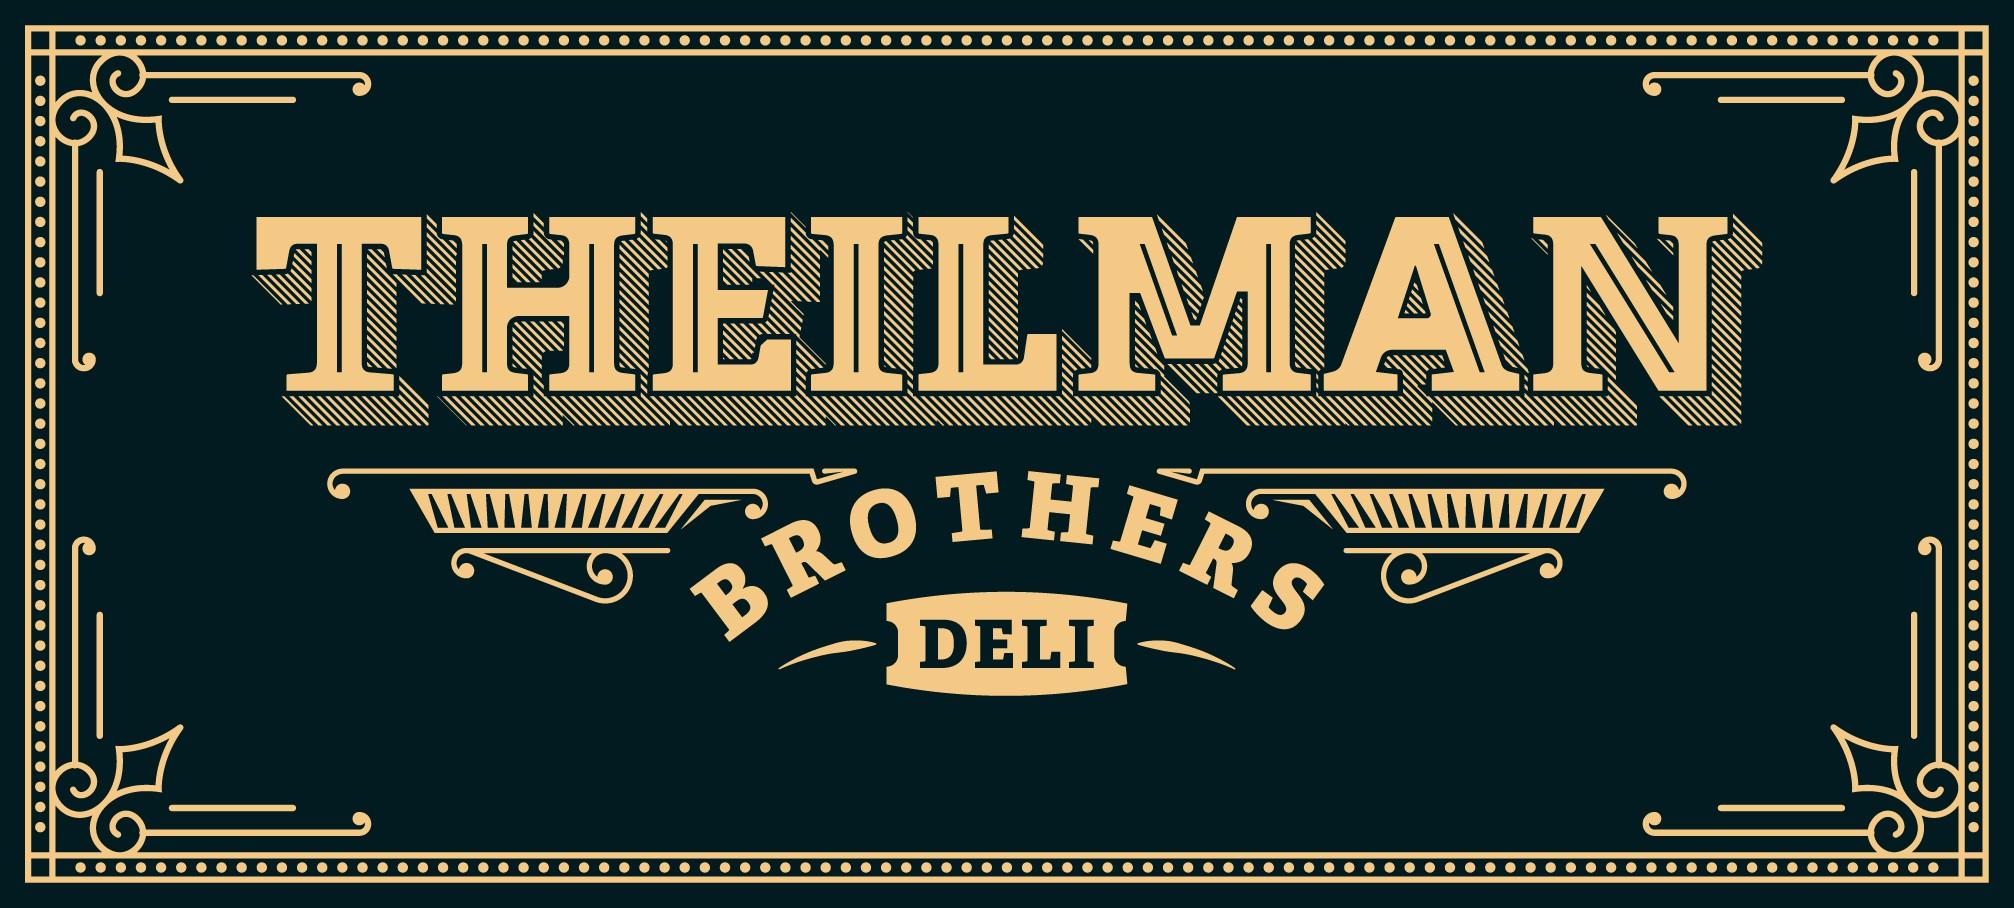 Theilman Brothers Deli Contest - Vintage - Open to Ideas